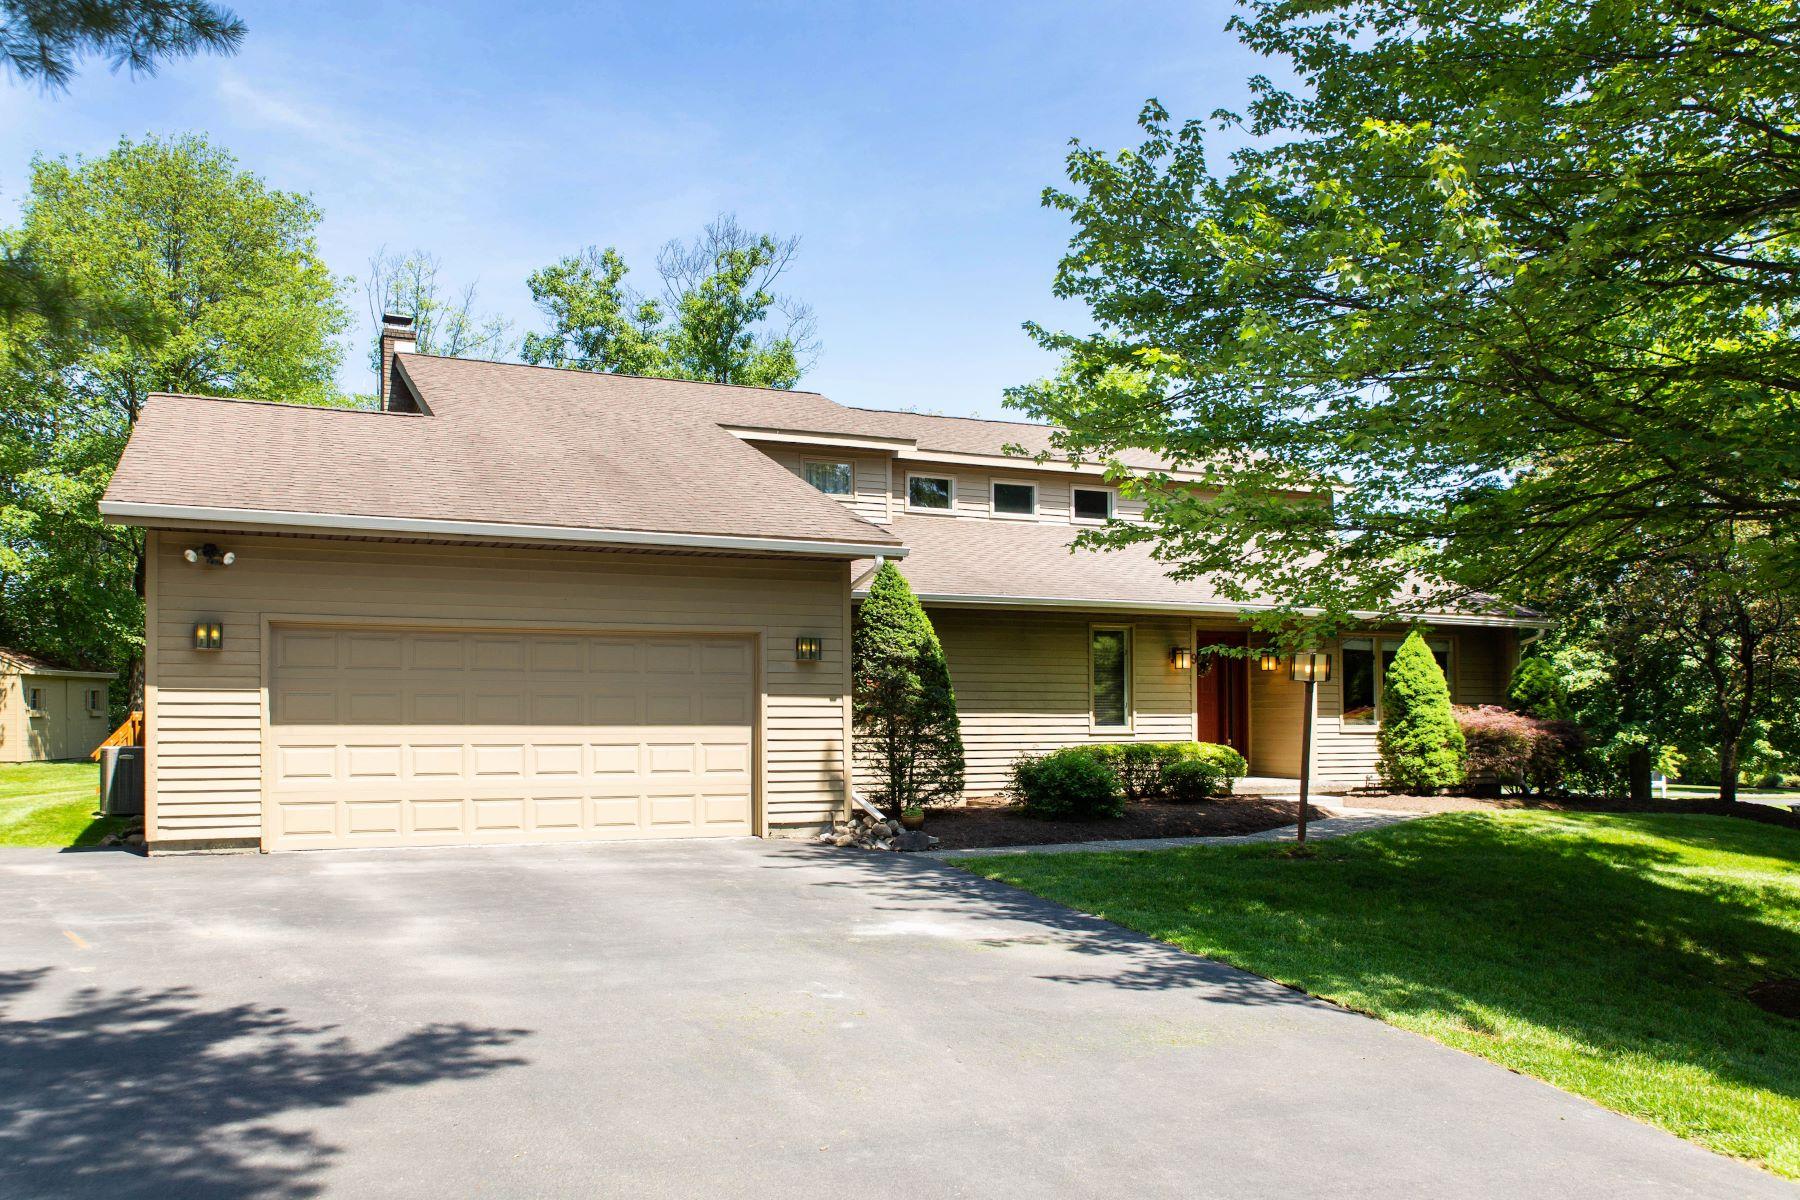 Single Family Homes for Active at Spacious Home On Corner Lot 9 Gloria Lane Niskayuna, New York 12309 United States